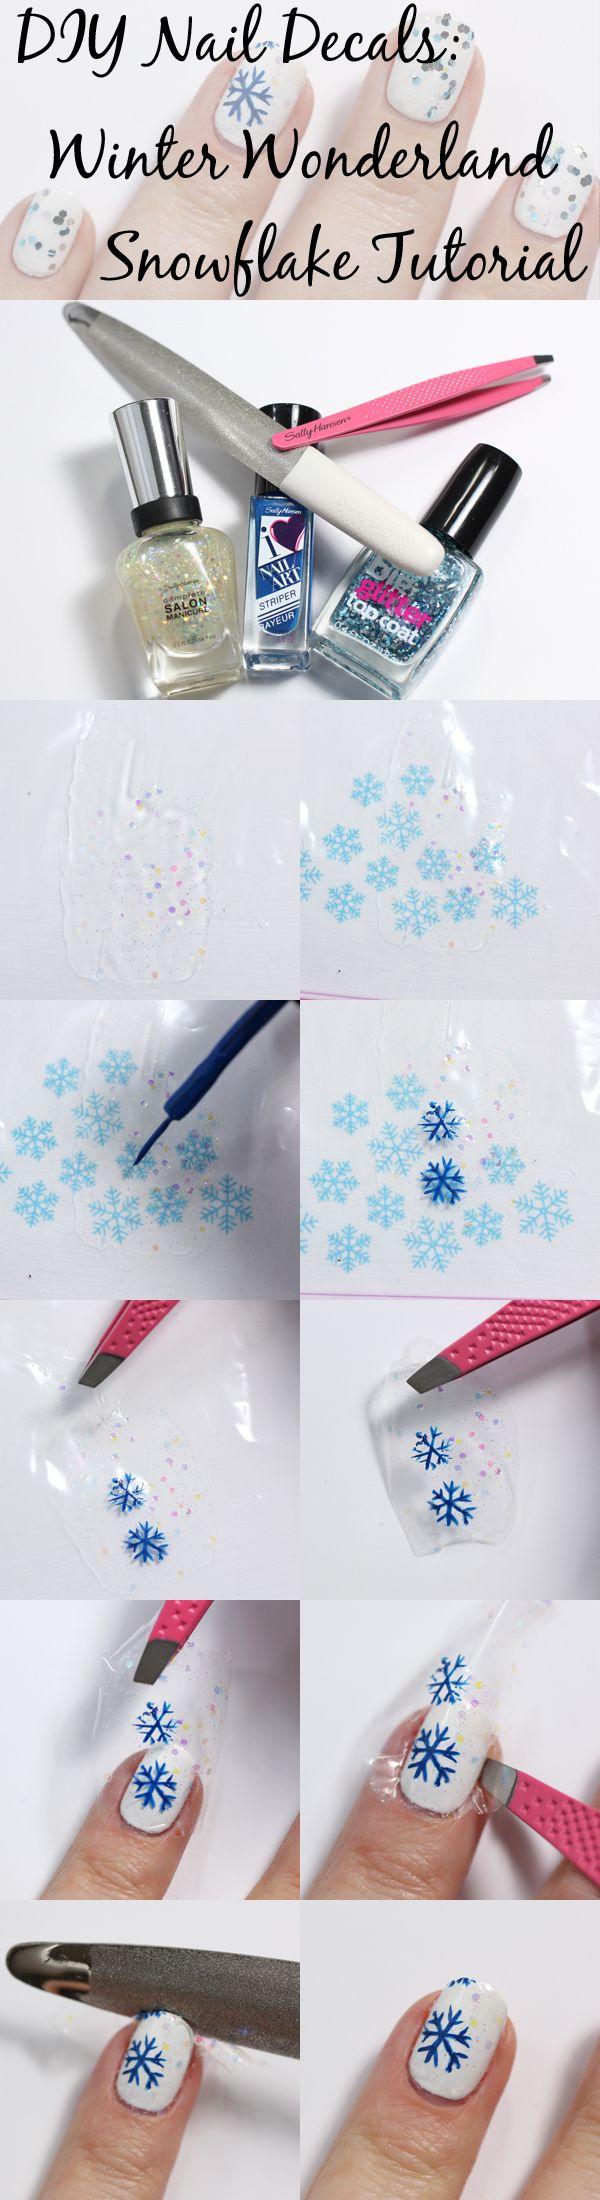 Last-Minute-Christmas-Nail-Art-Hacks-n-Tricks (14)